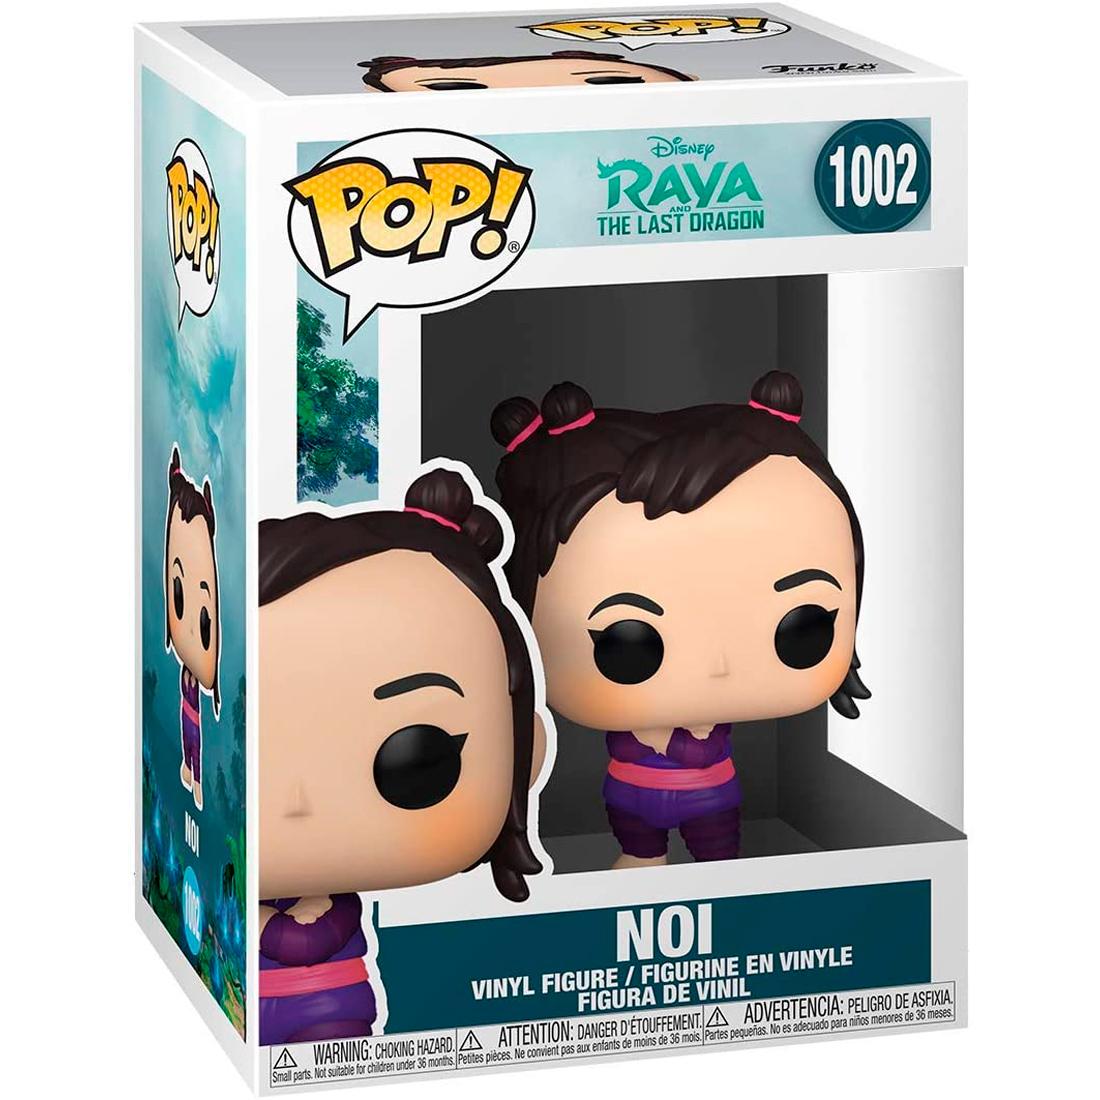 Funko Pop Disney Raya and the Last Dragon 1002 Noi